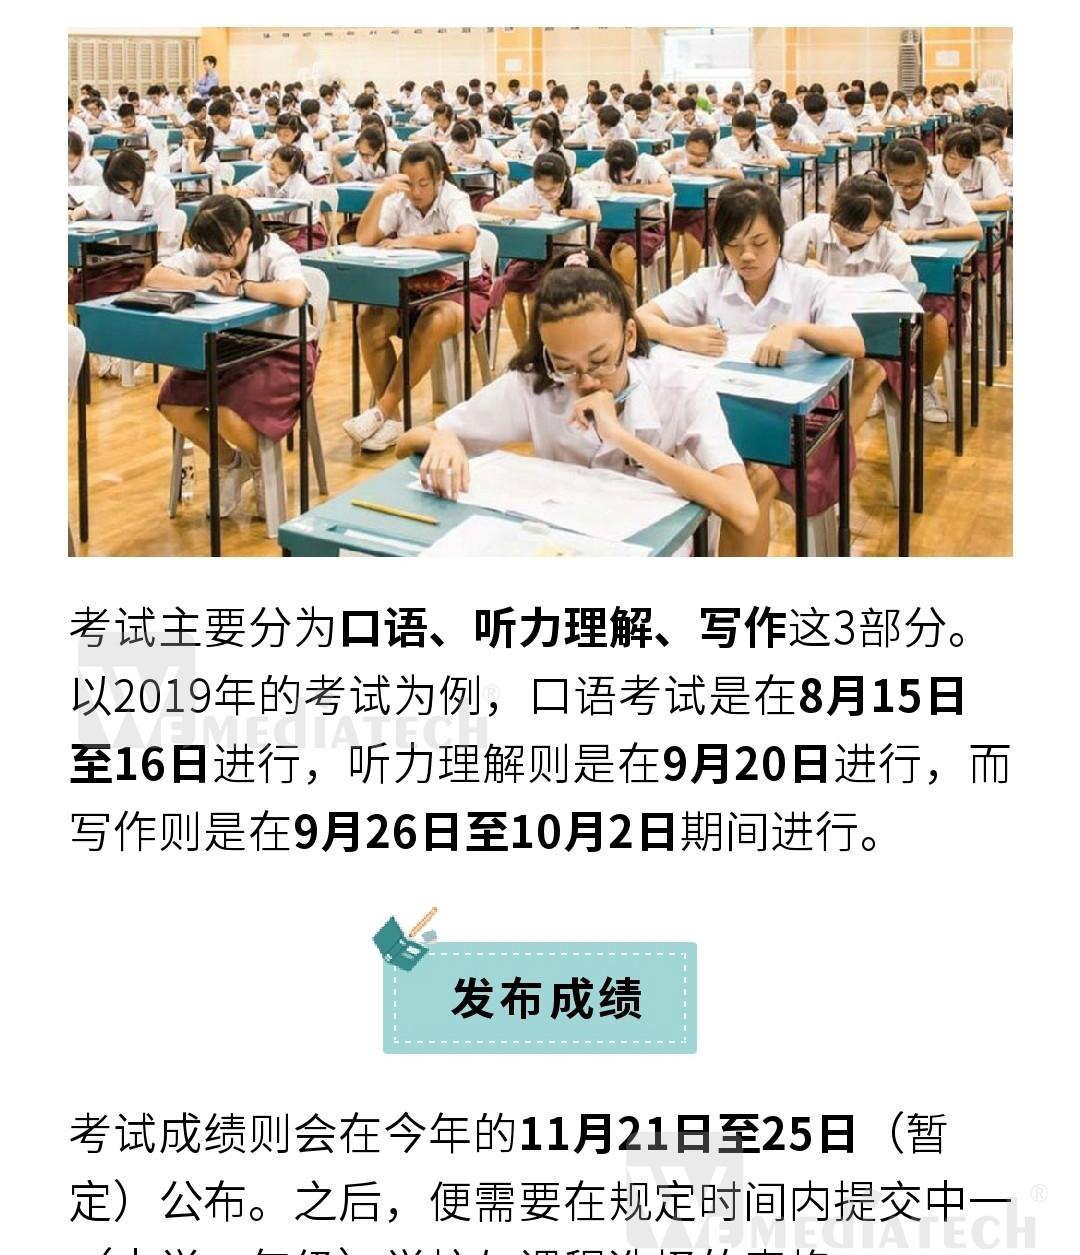 zhongxue-2_qietu_1.jpg